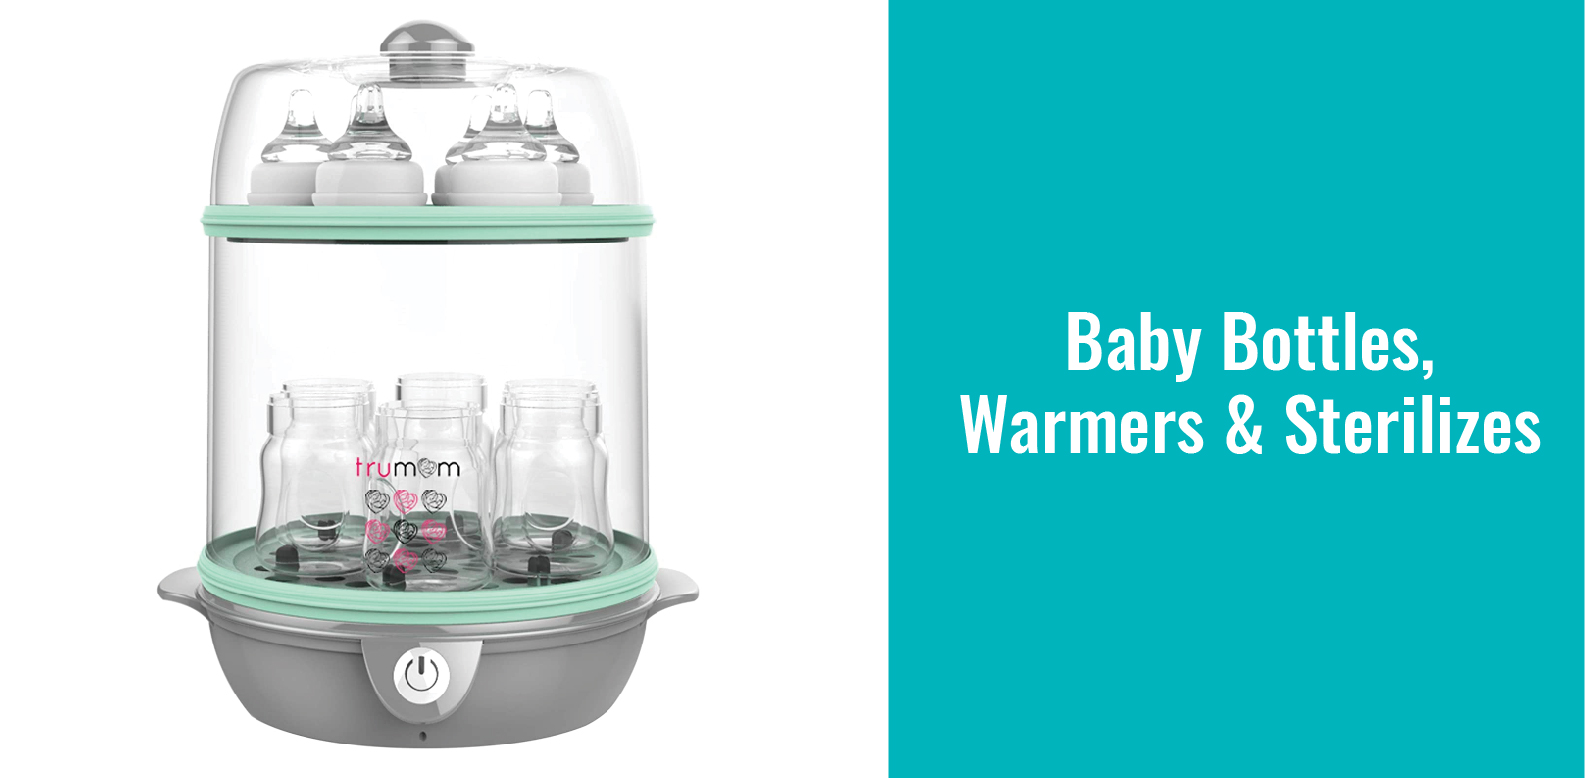 Baby Bottles, Warmers & Sterilizers